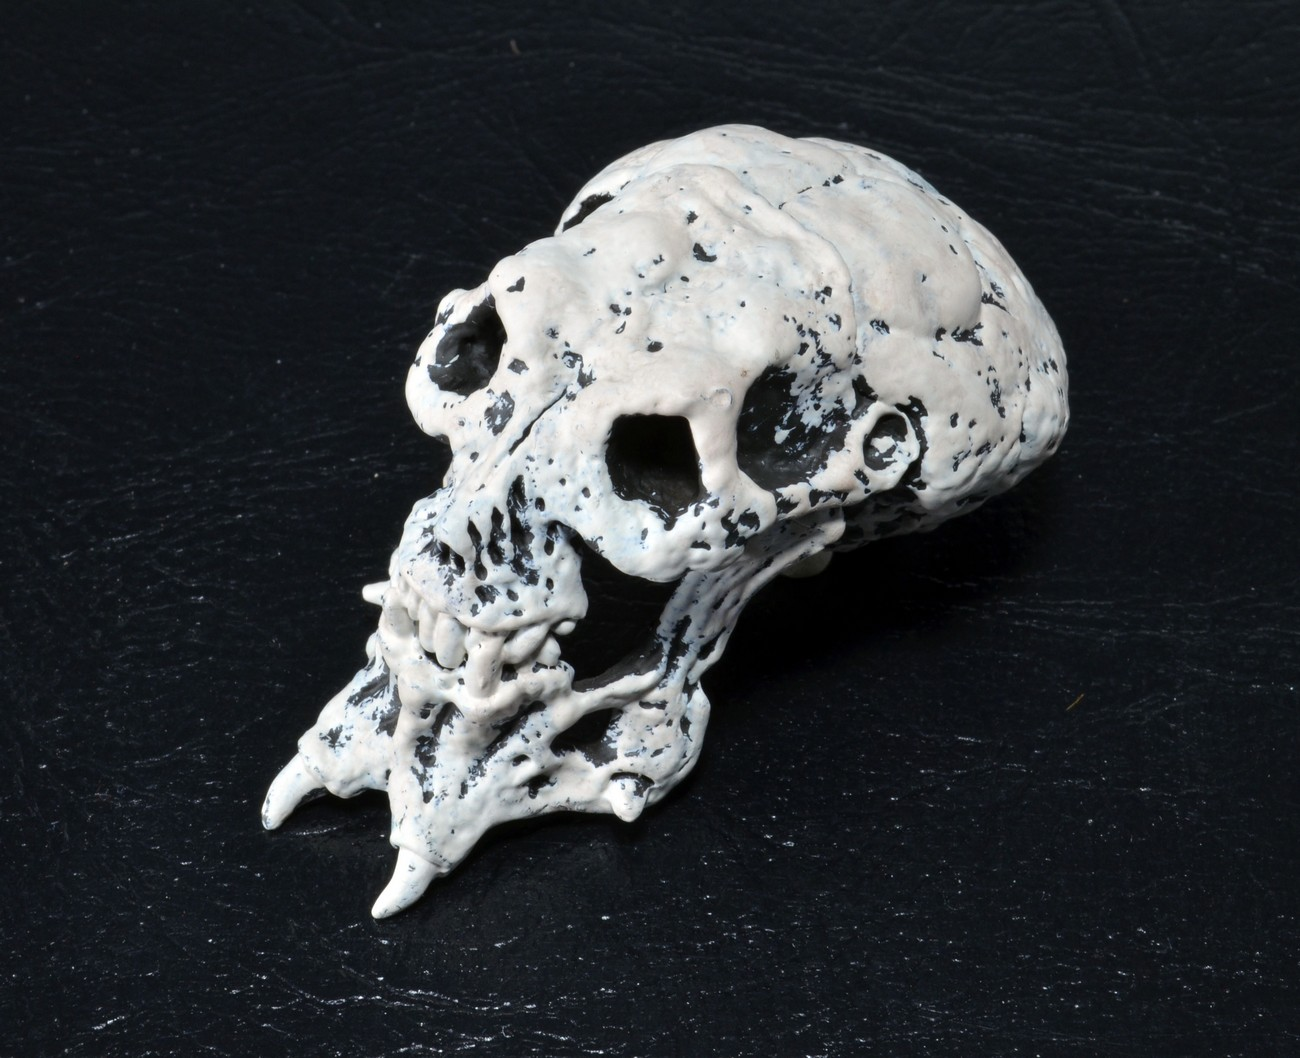 [NECA] [Tópico Oficial] PREDADORES - SDCC Exclusive: Dark Horse Comics - Ahab Predator - Página 20 Predator-Skull-Trophy-Pack-010